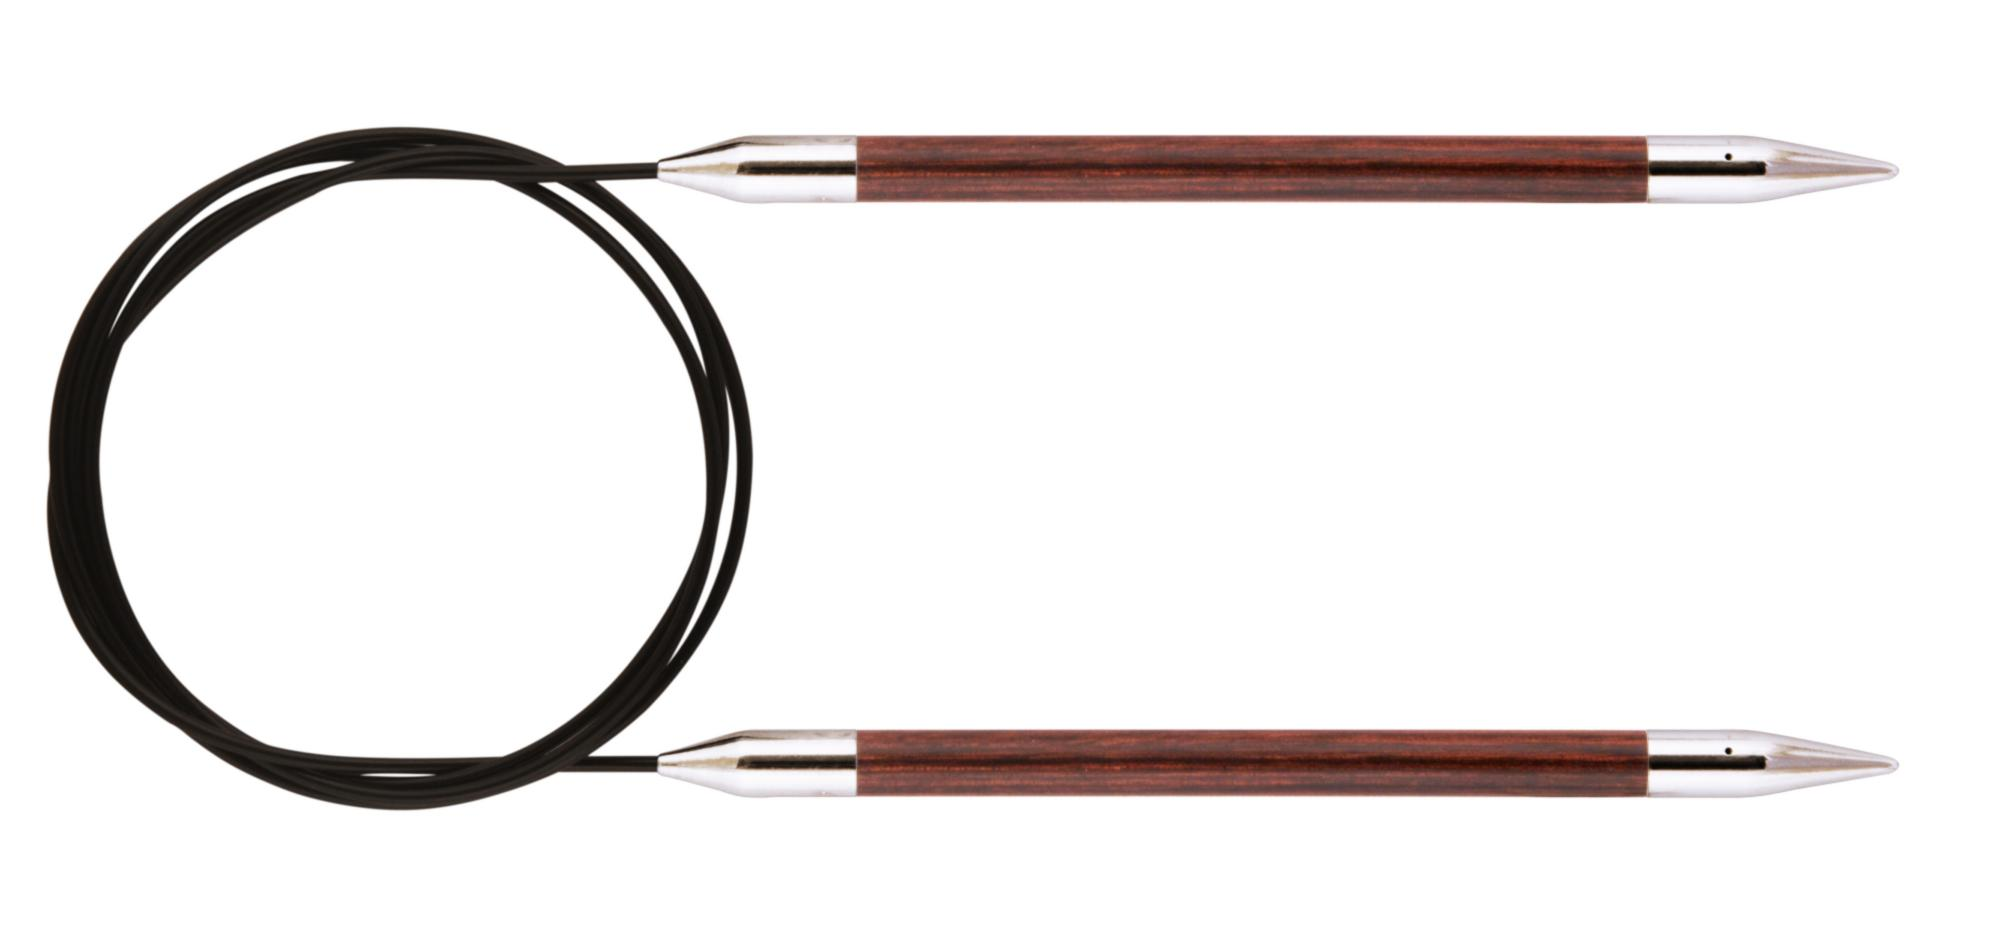 Спицы круговые 60 см Royale KnitPro, 29081, 7.00 мм